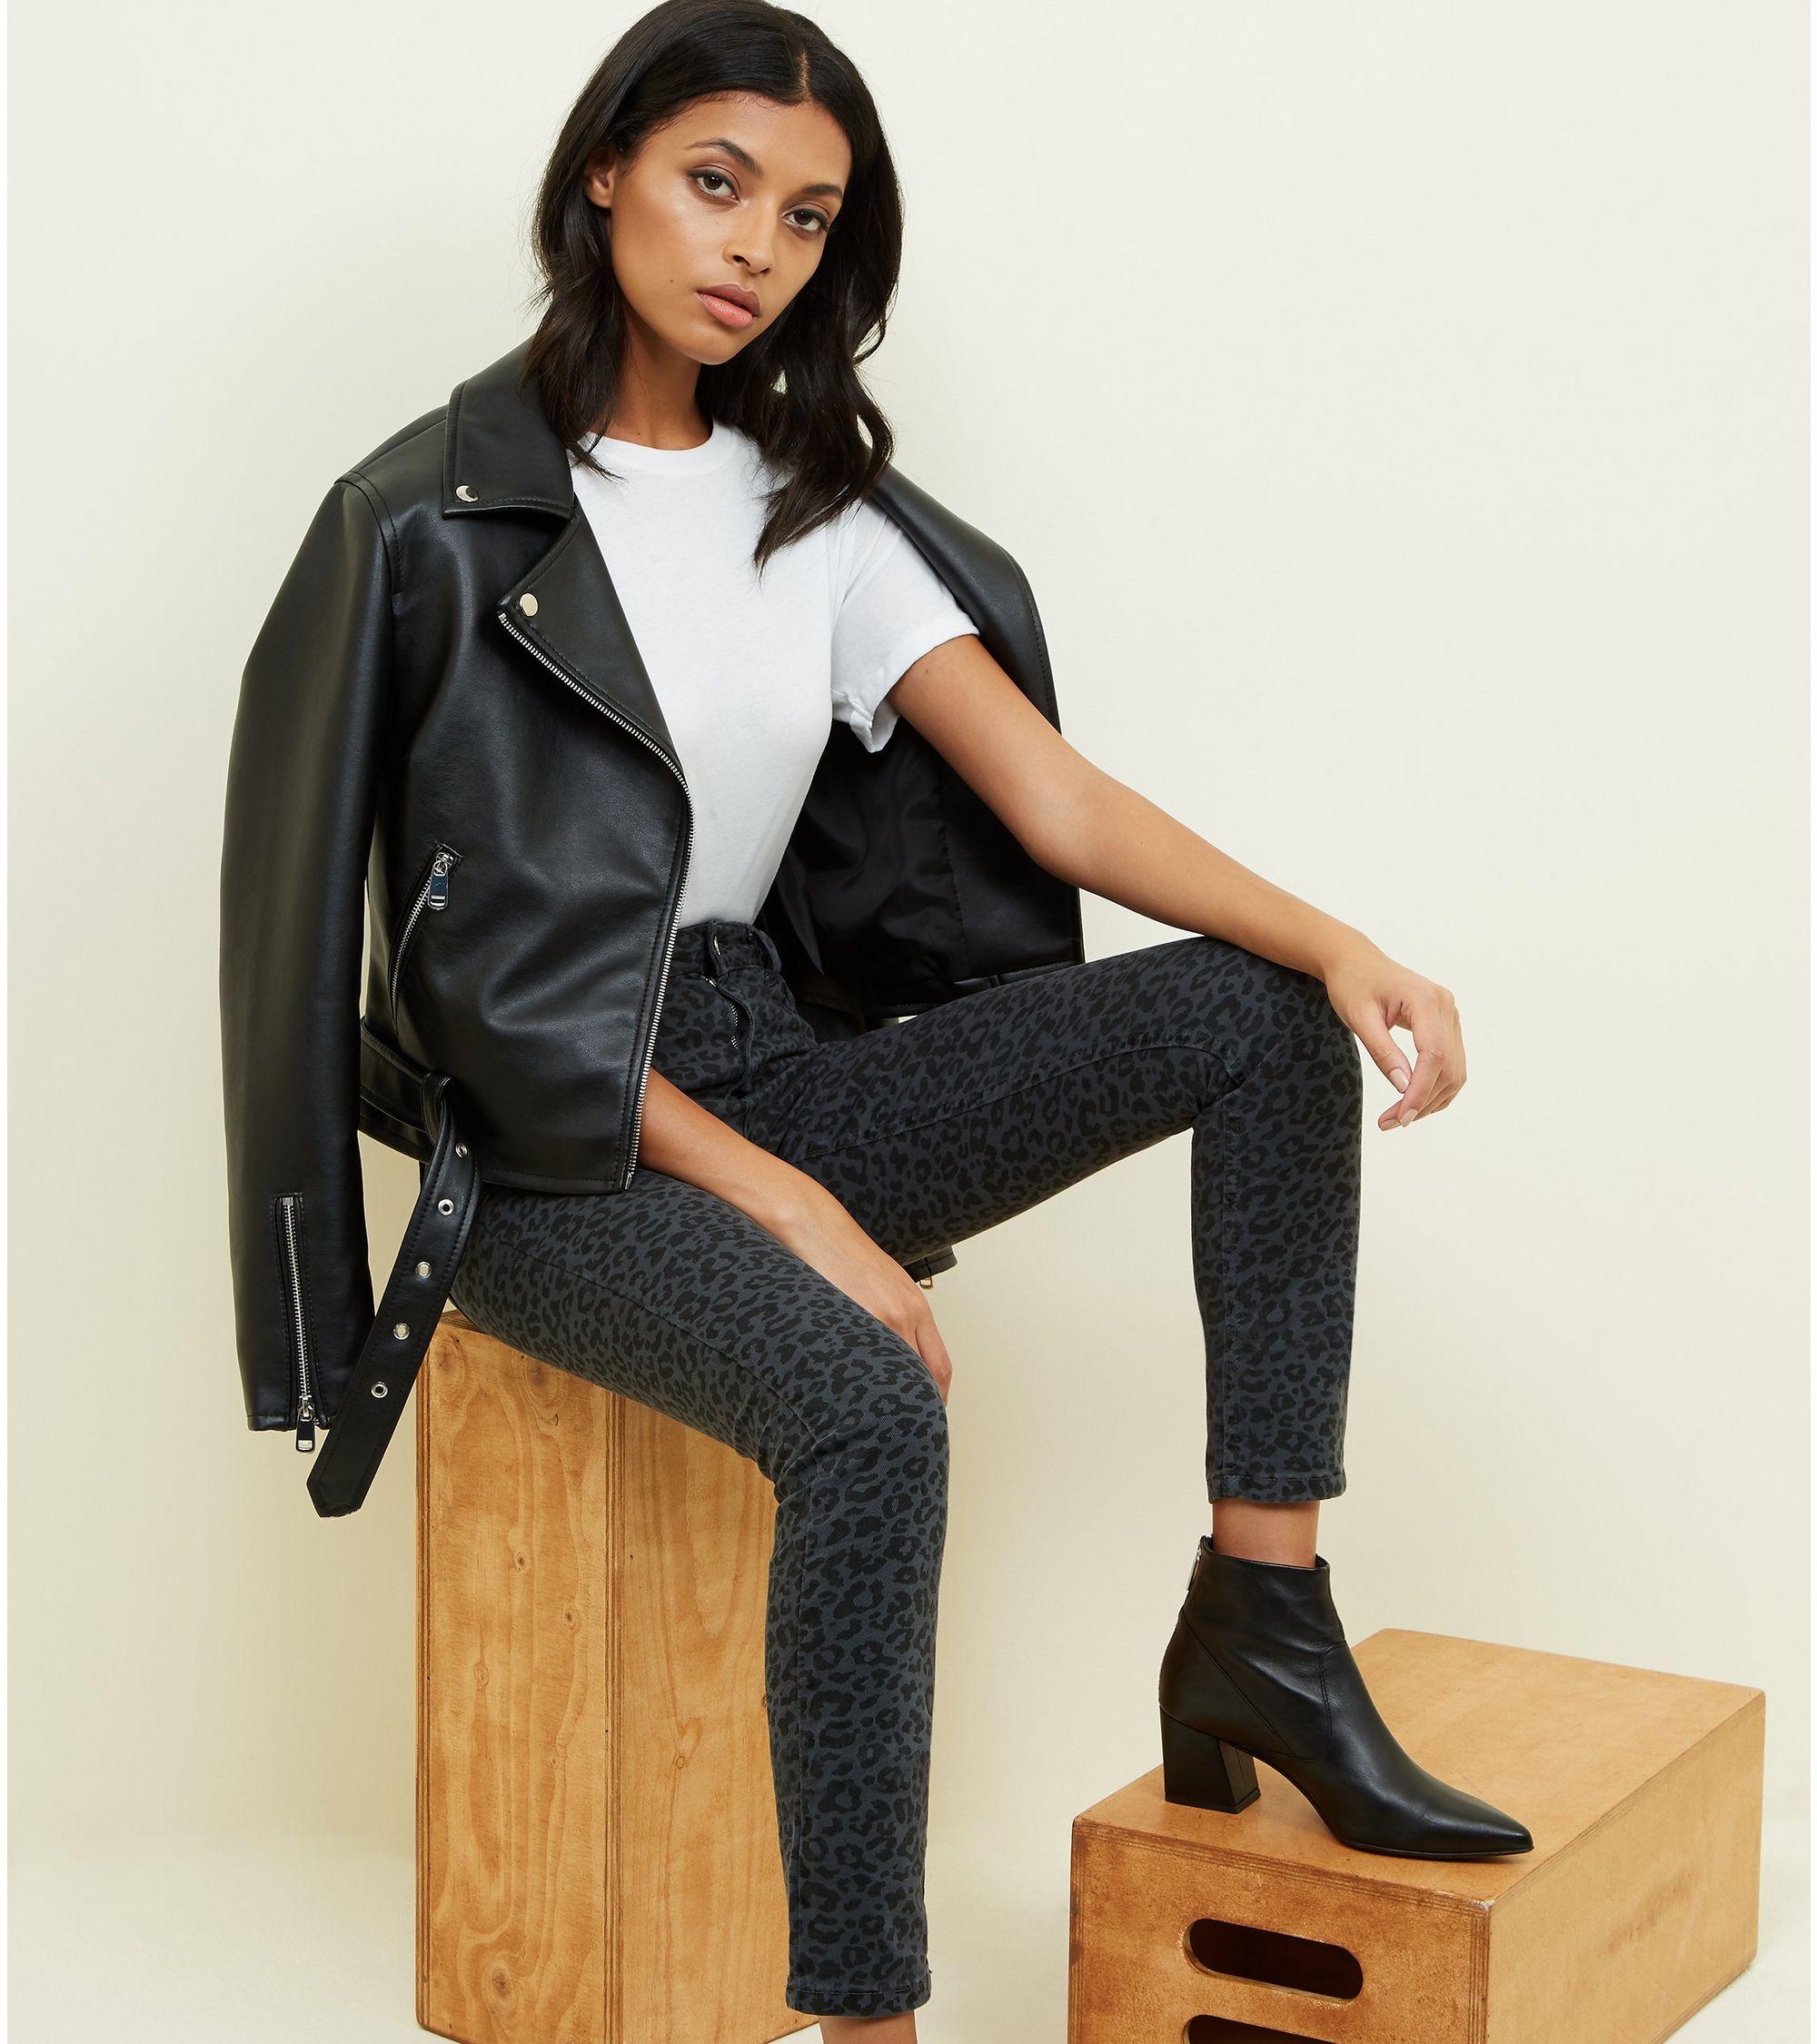 e79ec5c4ec3c8f New Look Grey Leopard Print Ankle Grazer Skinny Jenna Jeans at £14 ...